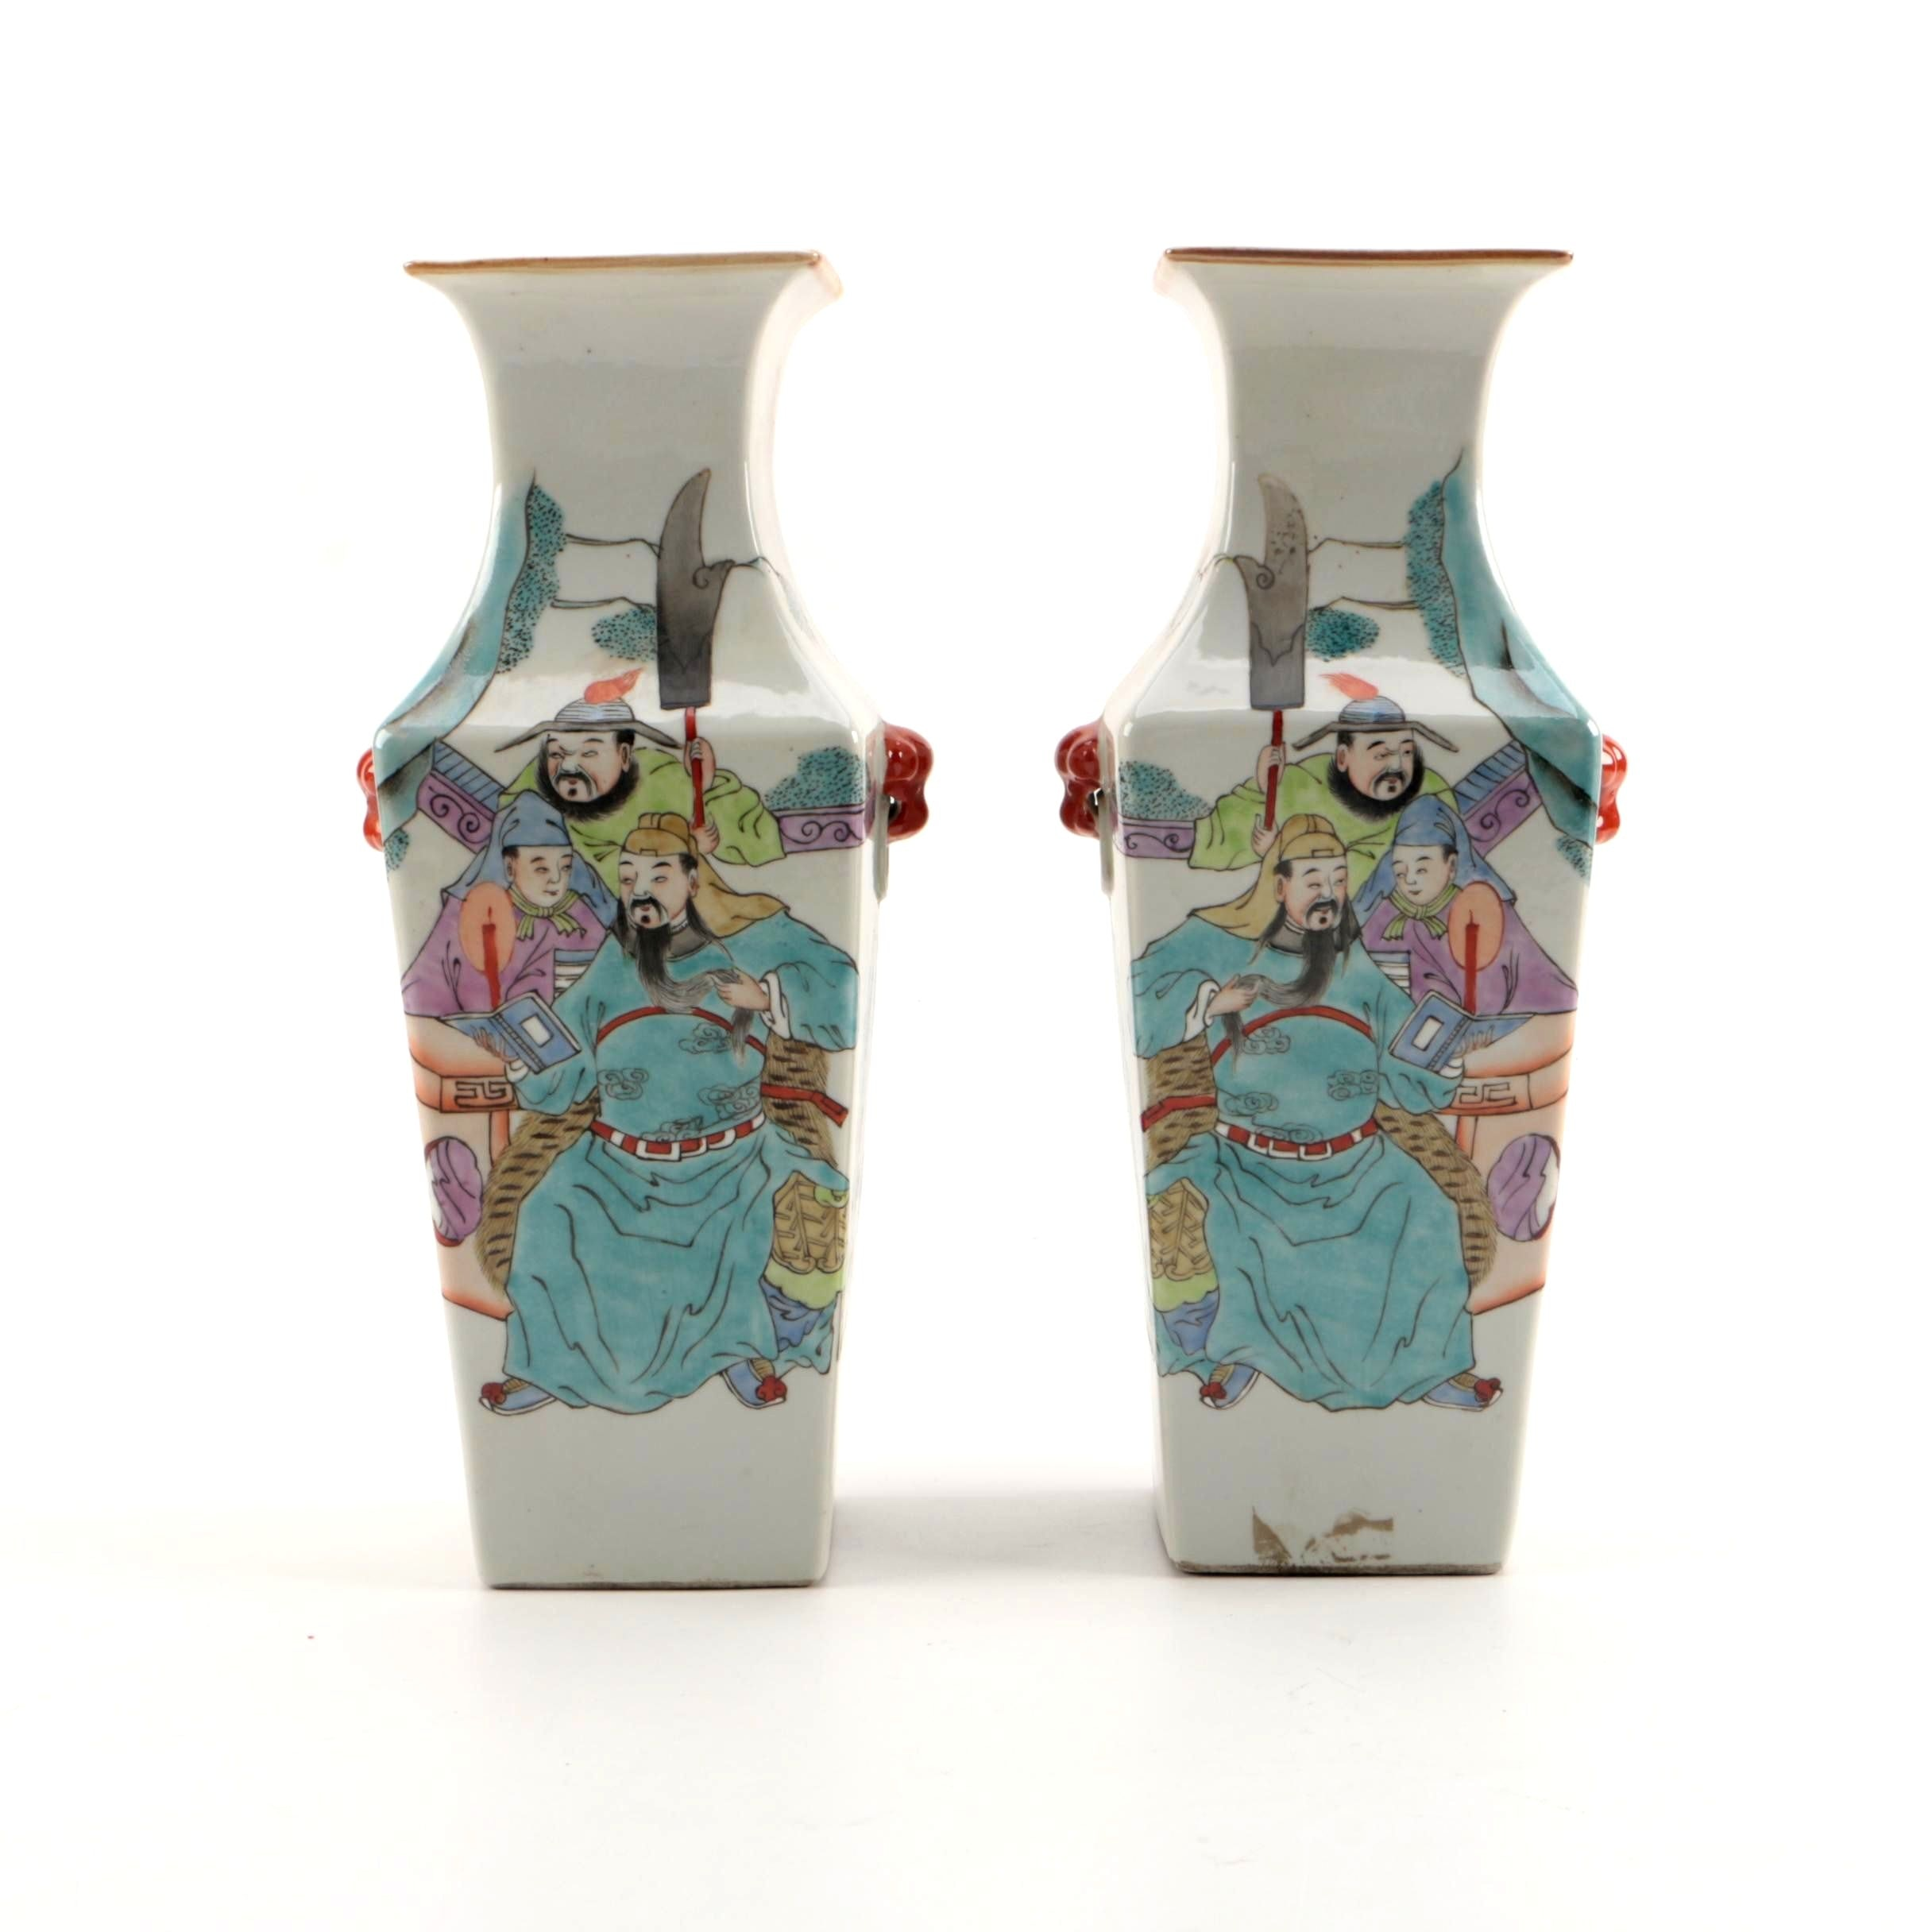 Chinese Hand-Painted Figurative Ceramic Handled Vases